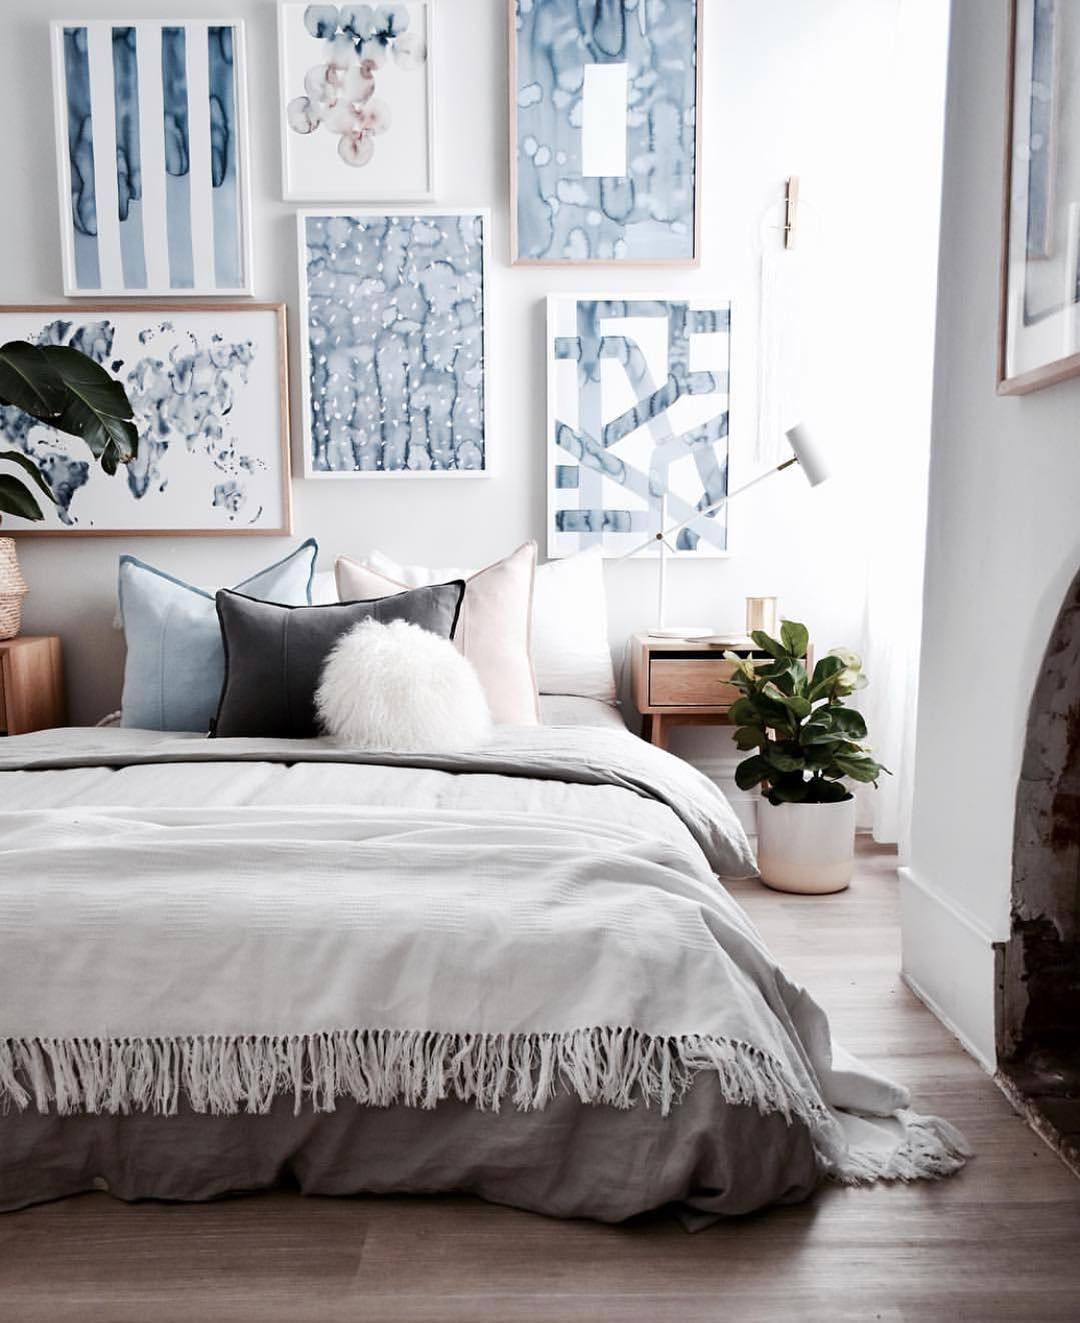 ilovedreamybedrooms ♥ Dreamy bedrooms on Instagram • photo ...